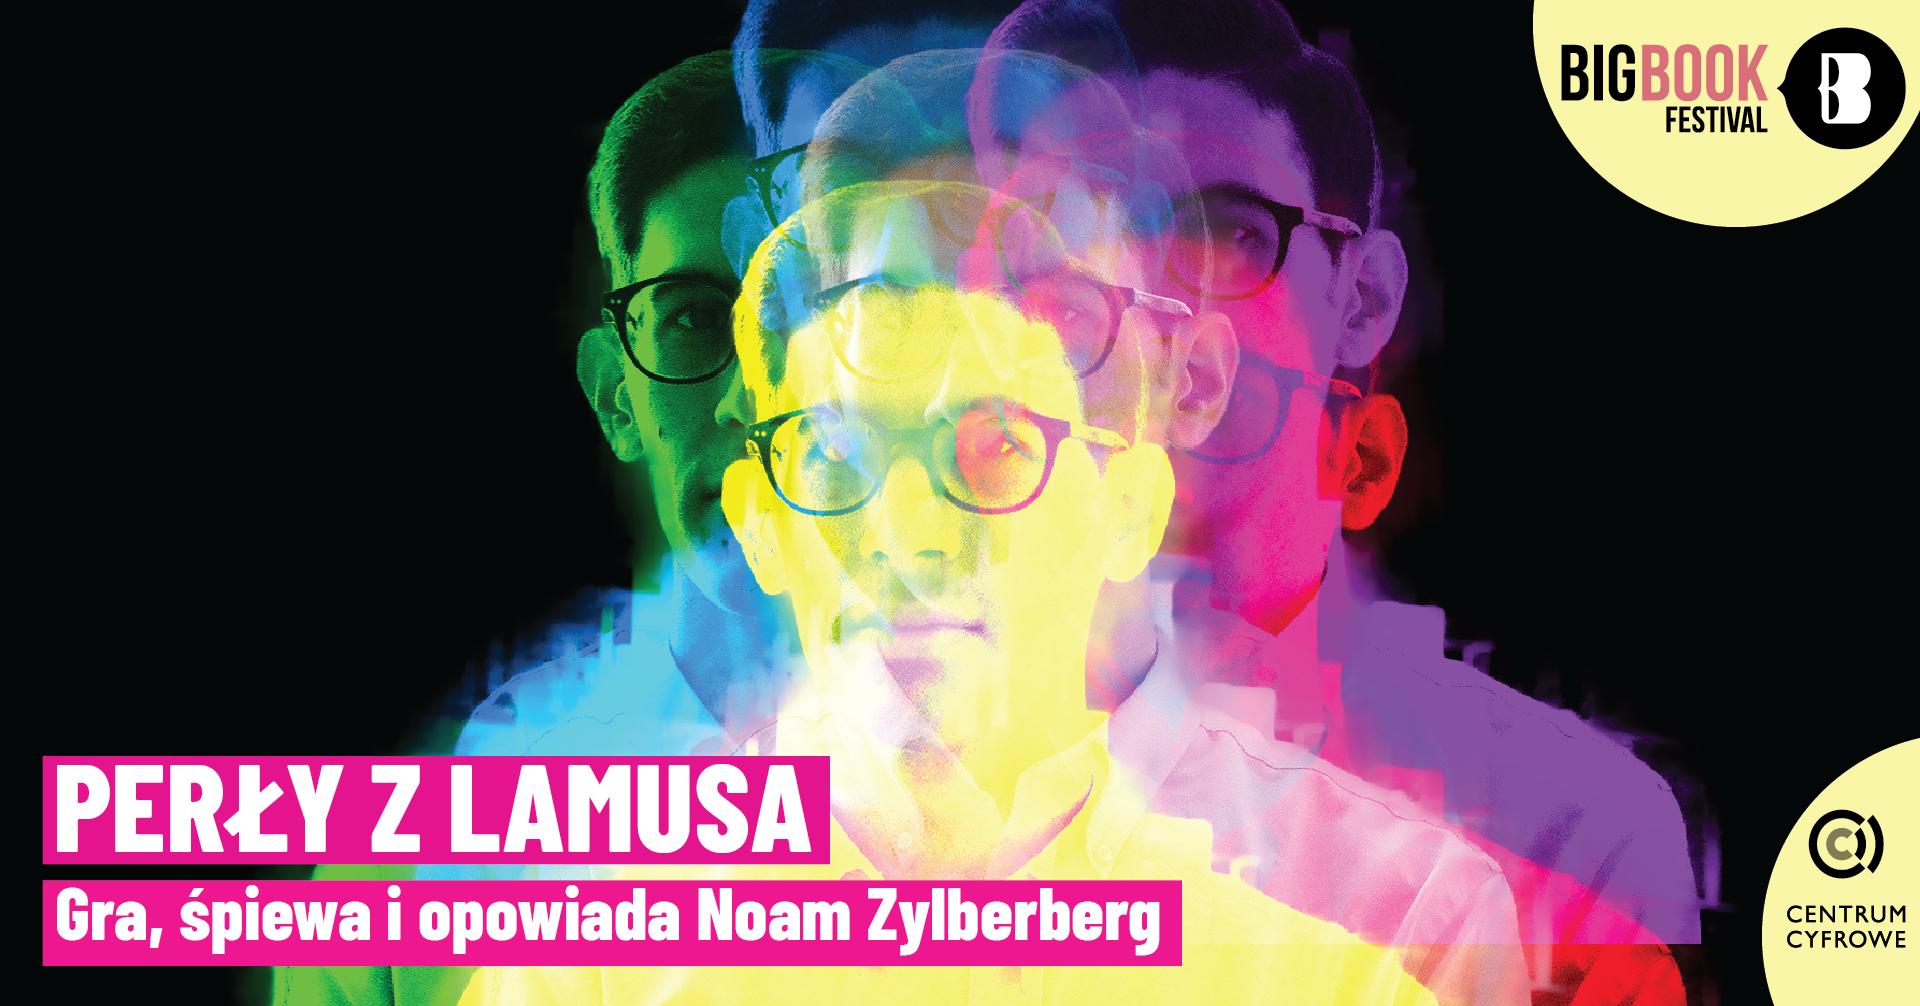 PERŁY Z LAMUSA-NOAM ZYLBERBERG-WYDARZENIE FACEBOOK-BIG BOOK FESTIVAL 2020